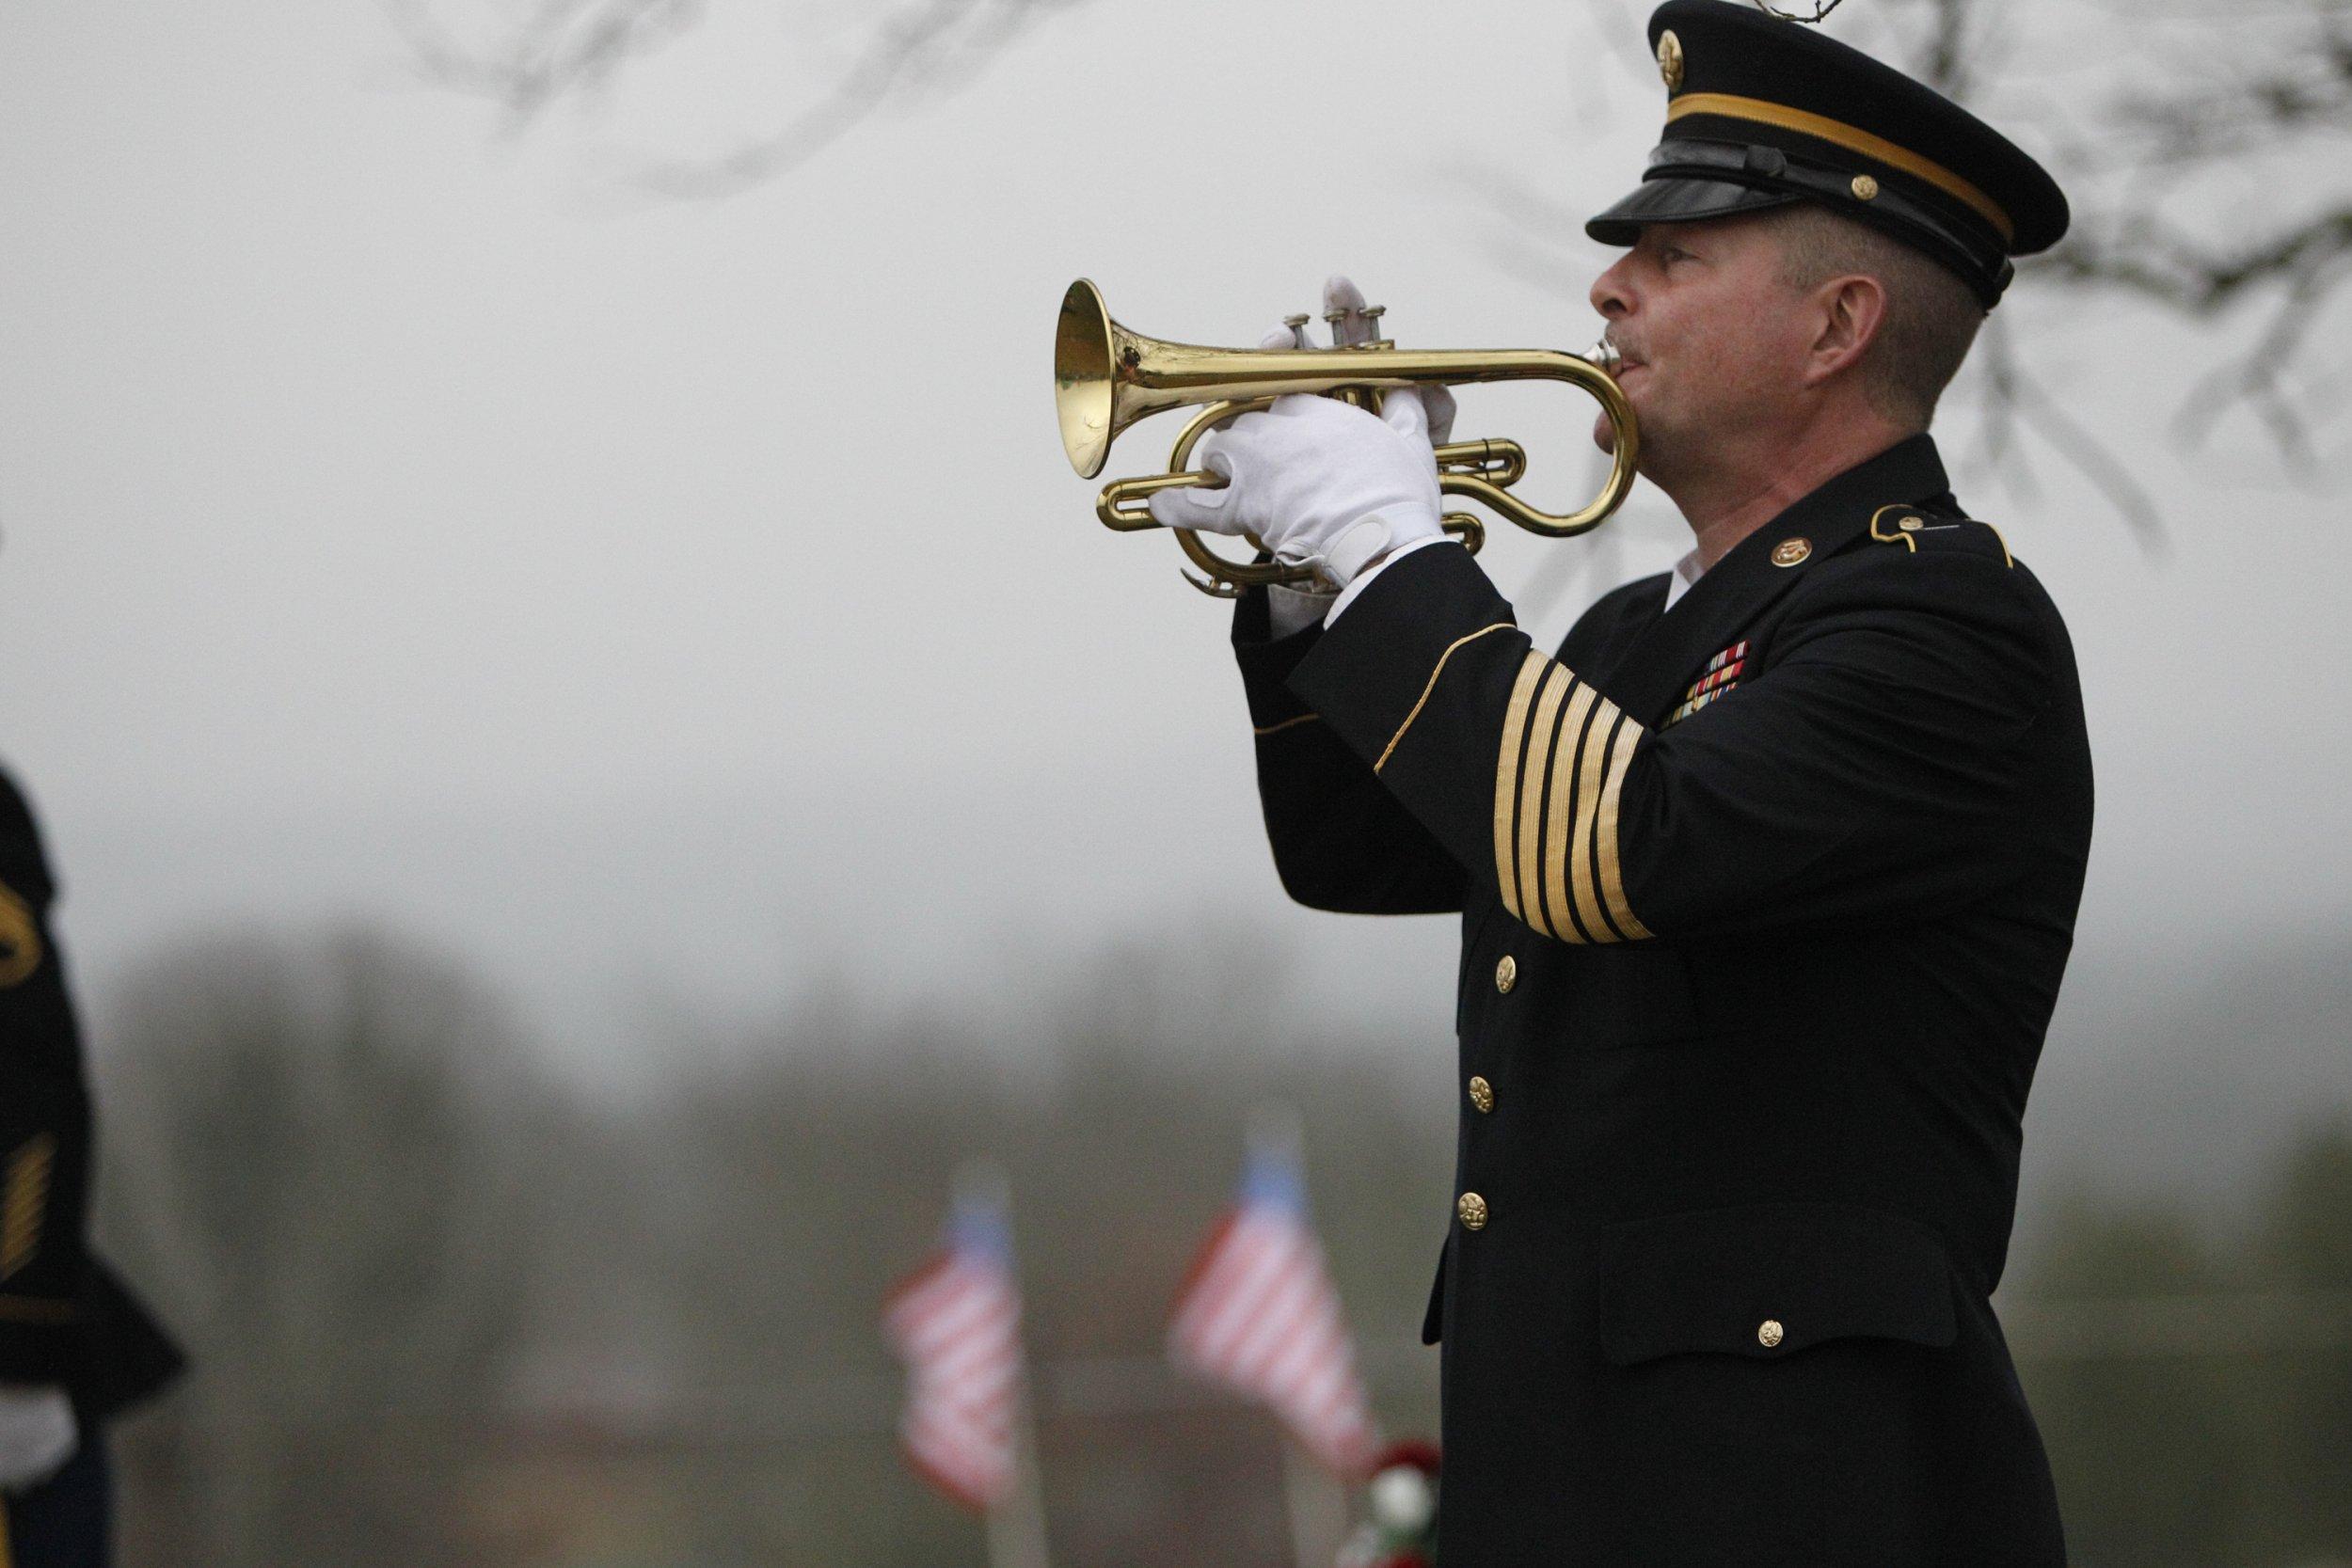 0329_Veterans_Protection_Act_guns_01